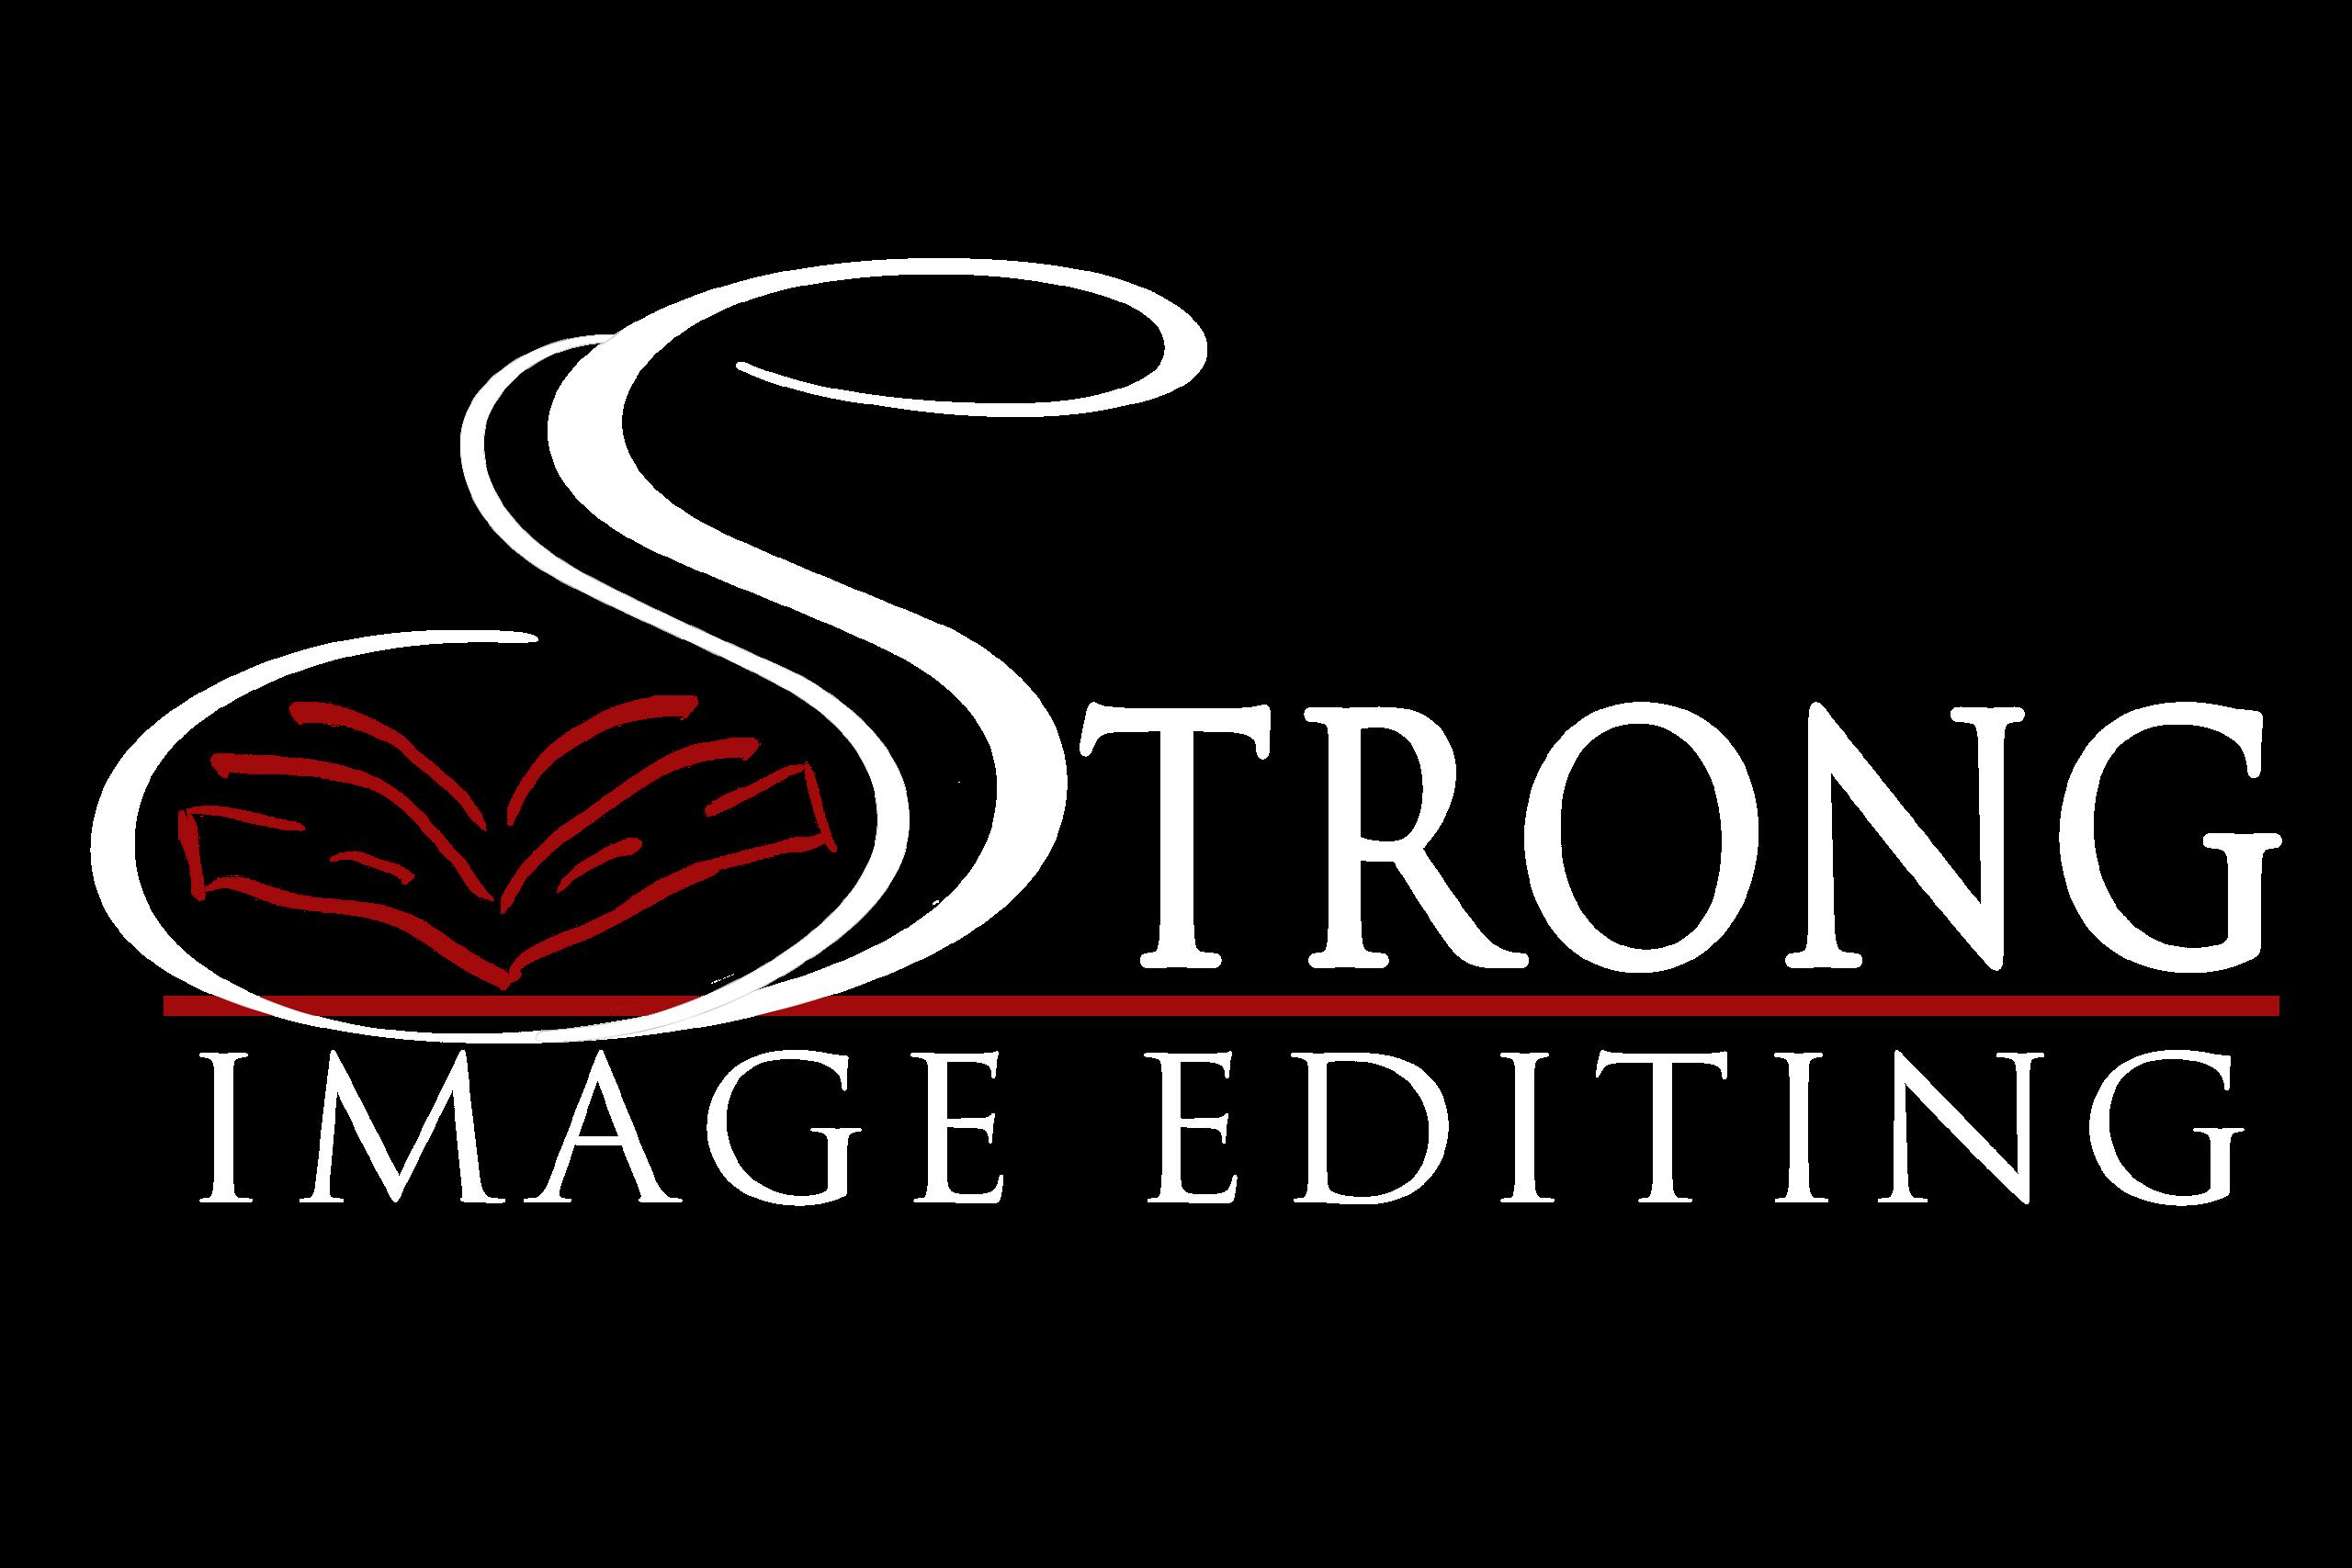 Strong Image Editing